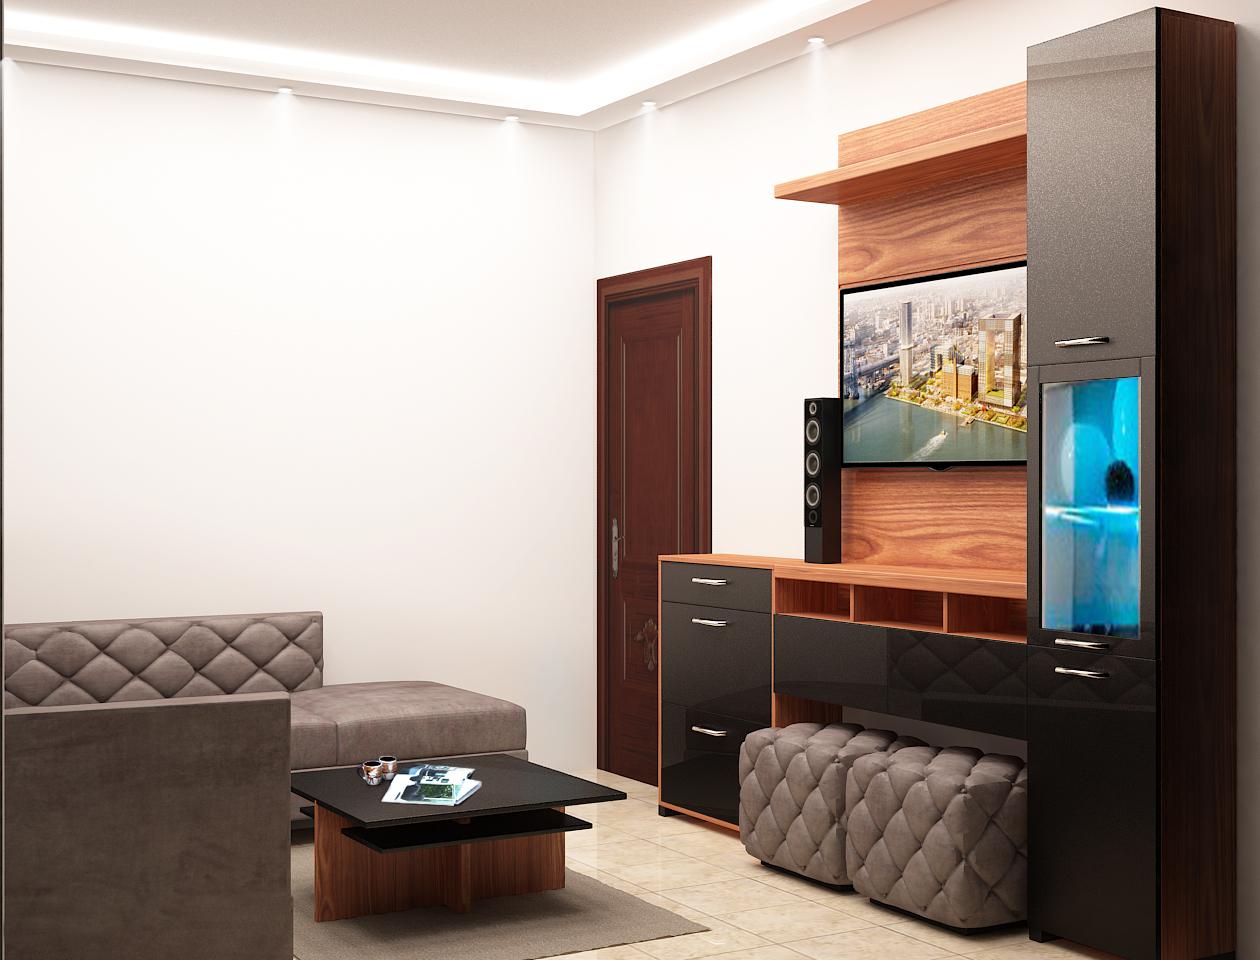 3 Bhk Full House Furniture Furniture Package